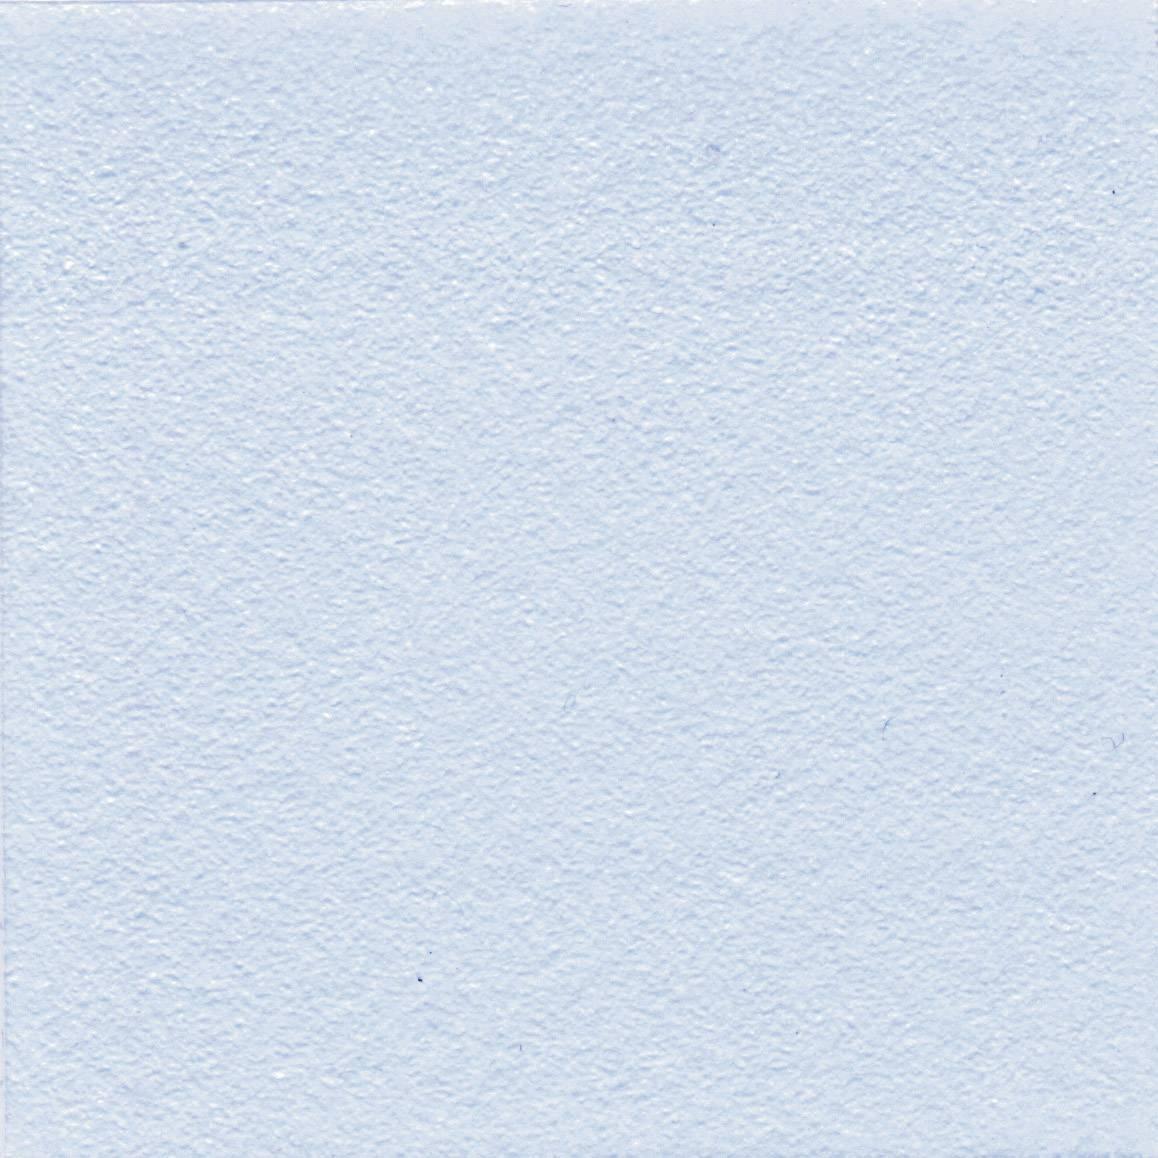 Teplovodivá fólia Kerafol SOFTTHERM 86/300, 0.5 mm, 3 W/mK, (d x š) 50 mm x 50 mm